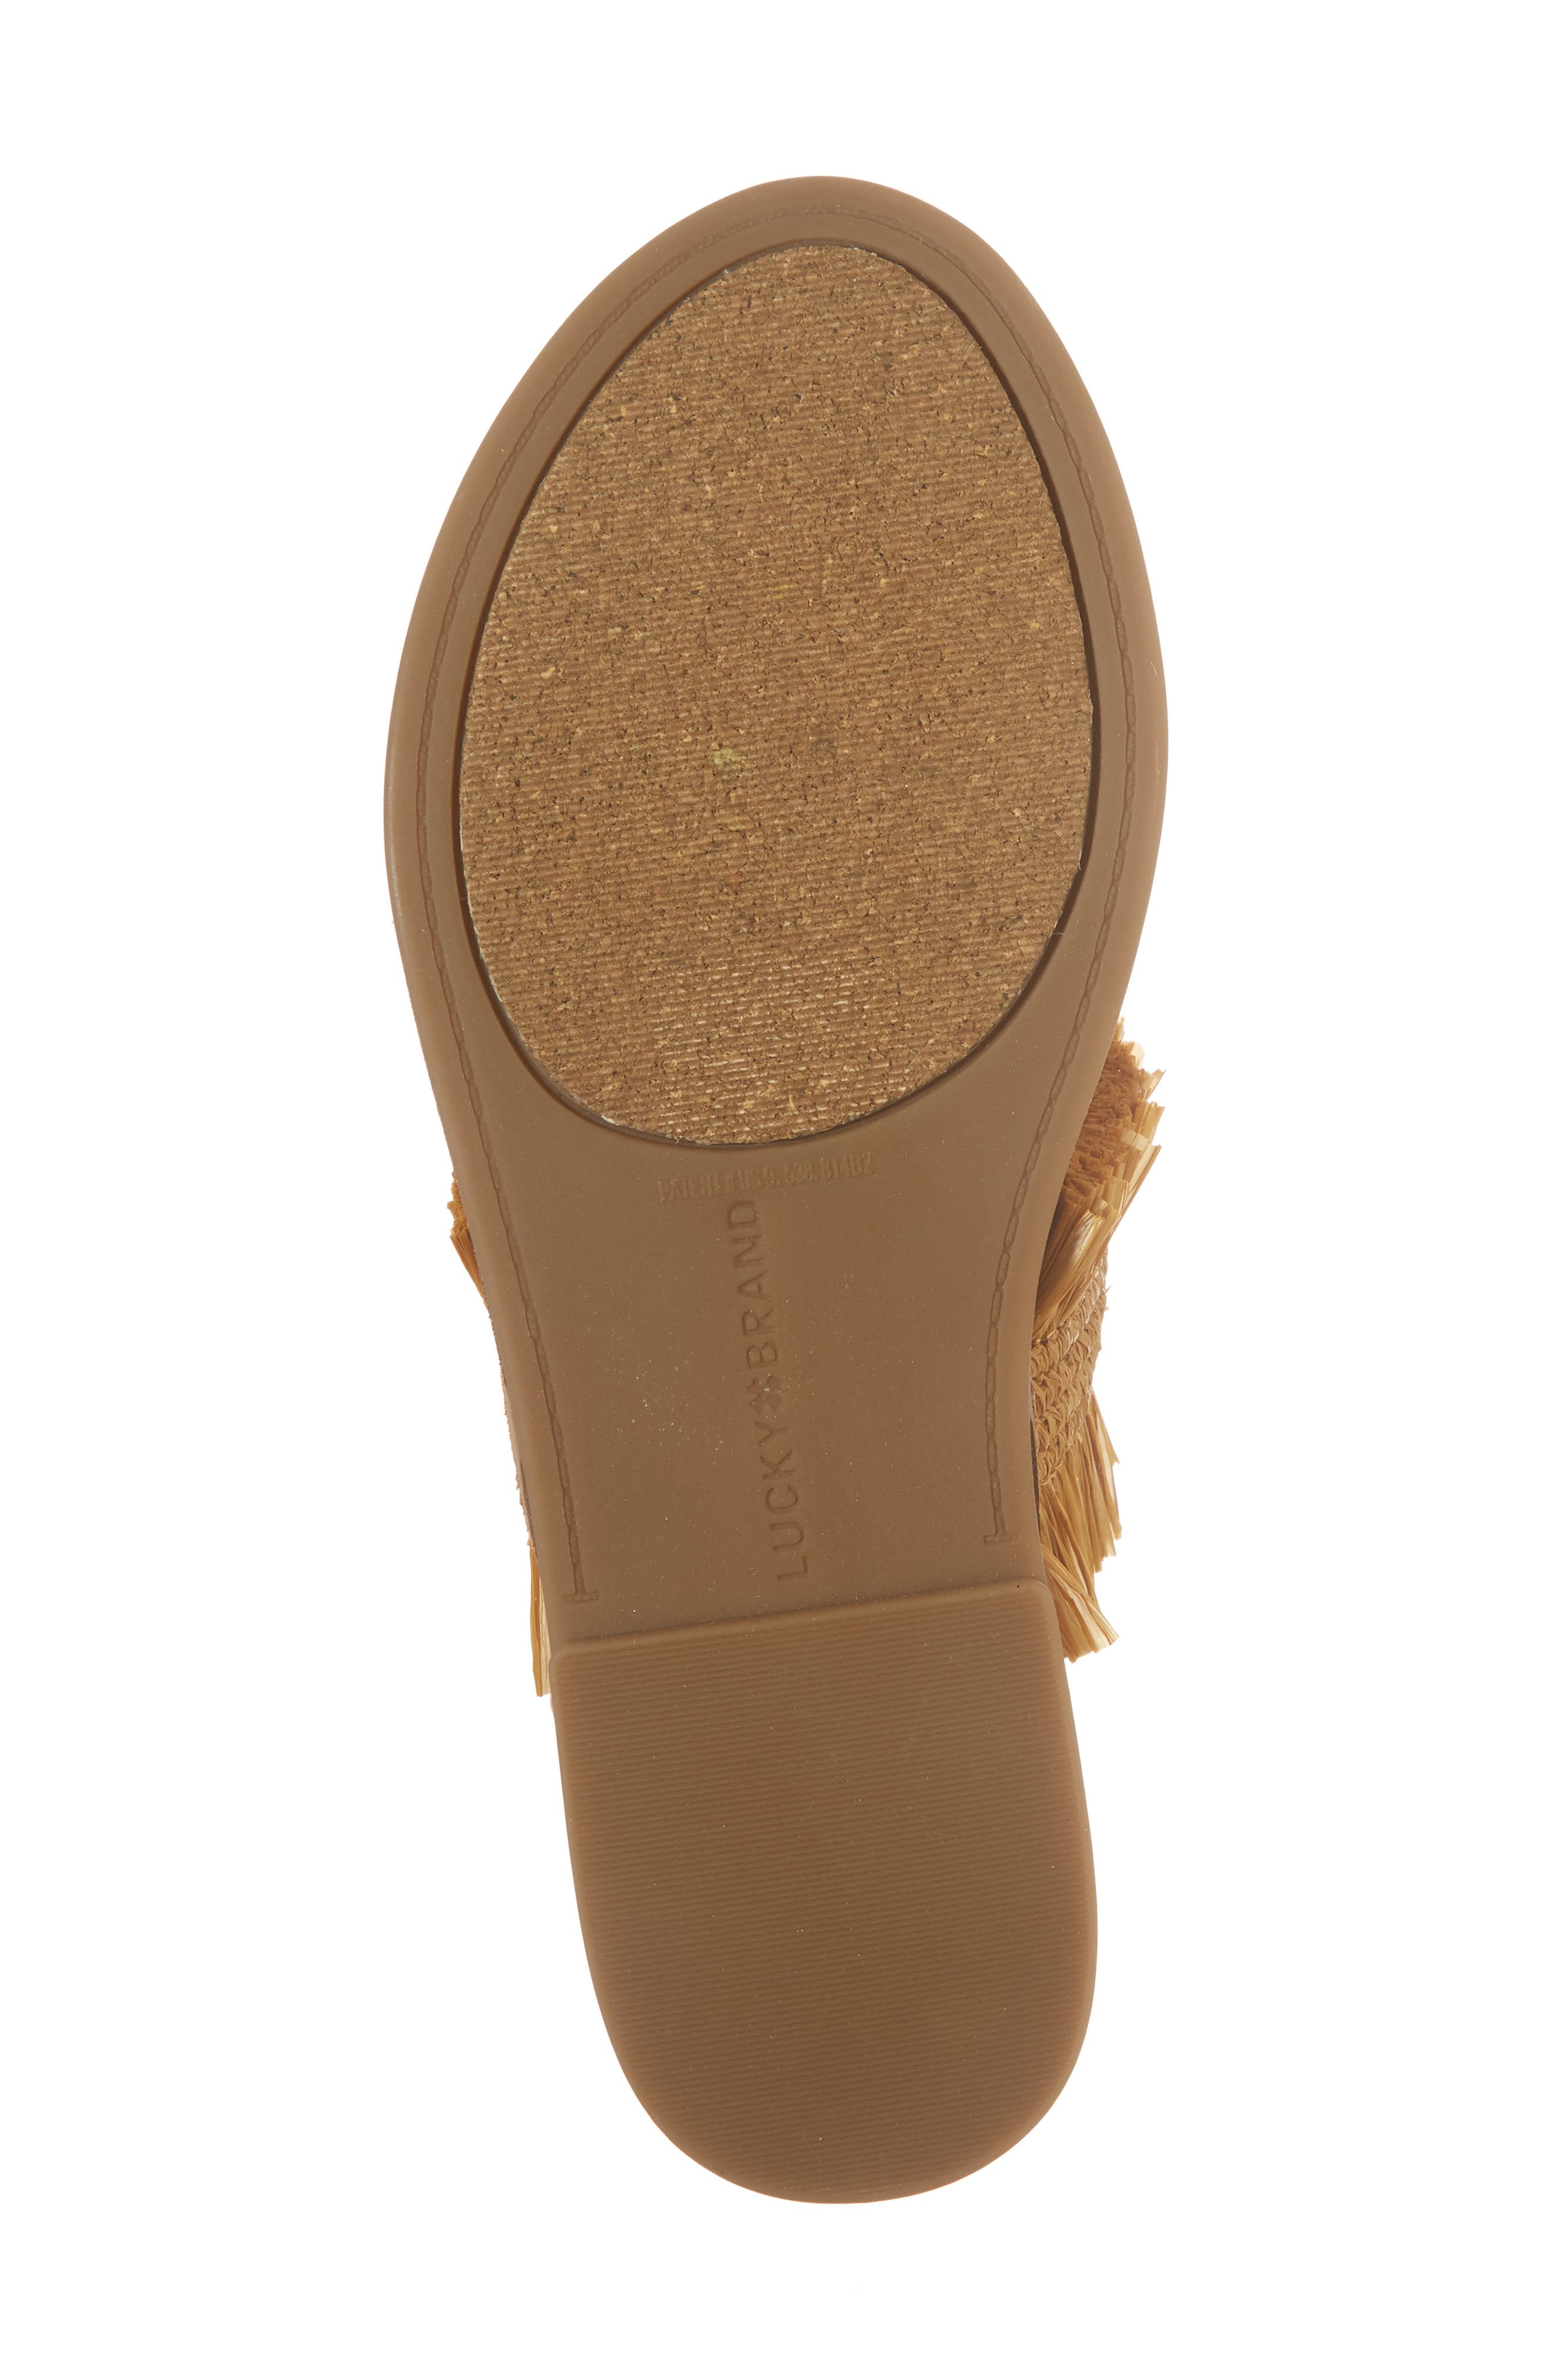 Akerlei Sandal,                             Alternate thumbnail 6, color,                             Saffron Leather